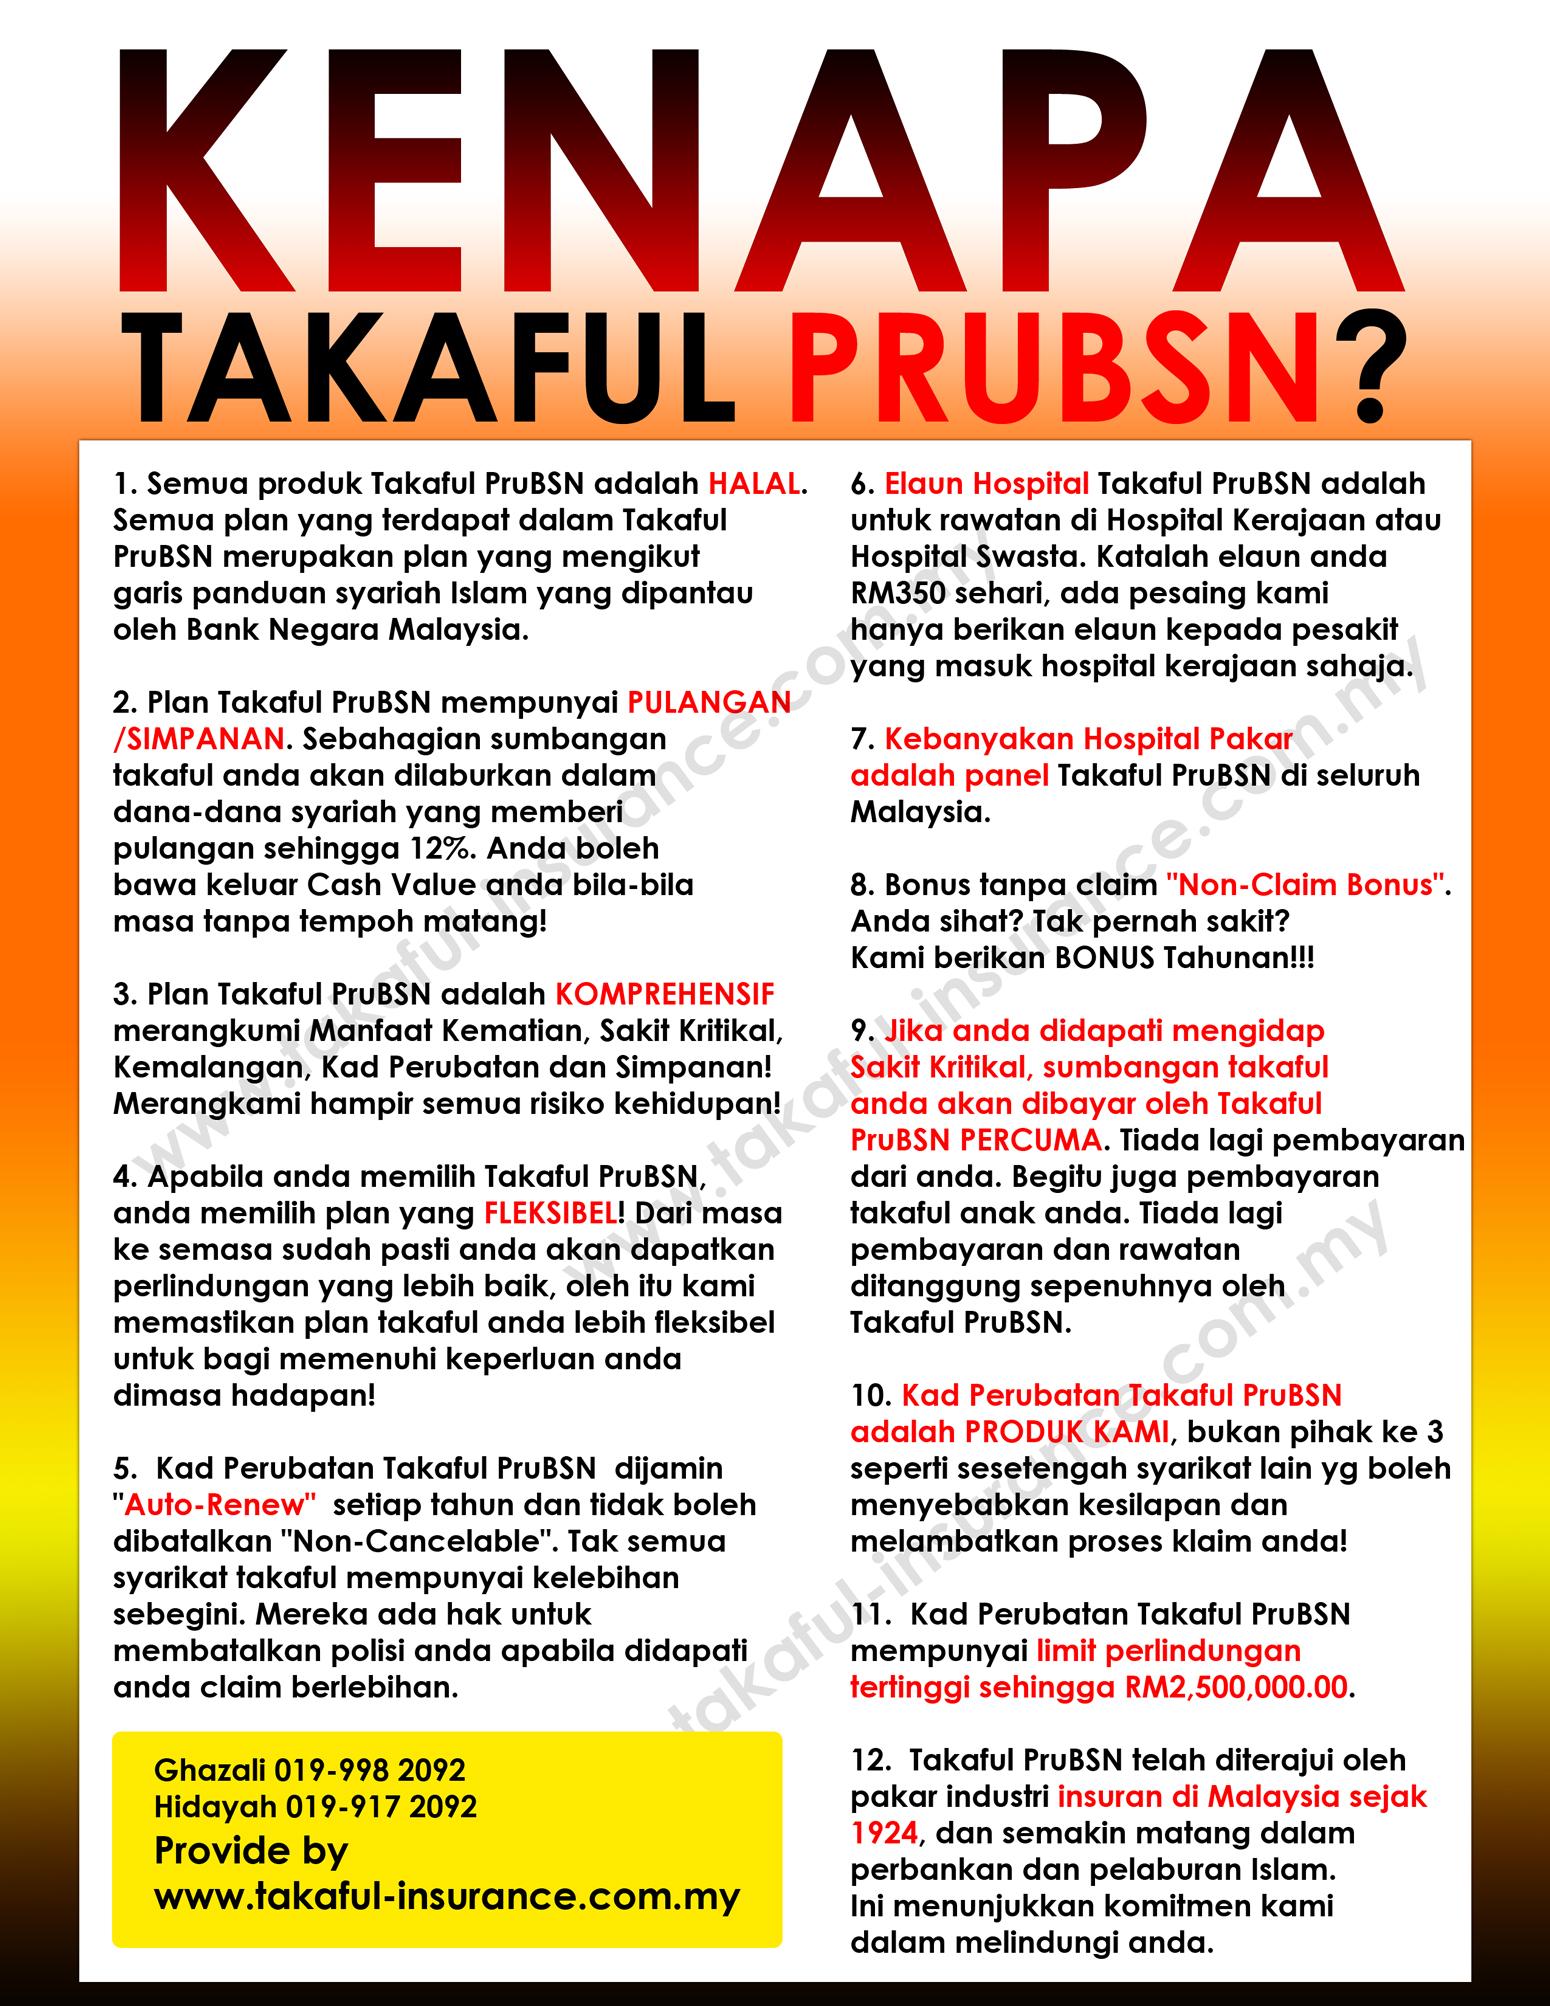 Kenapa-takaful-prubsn